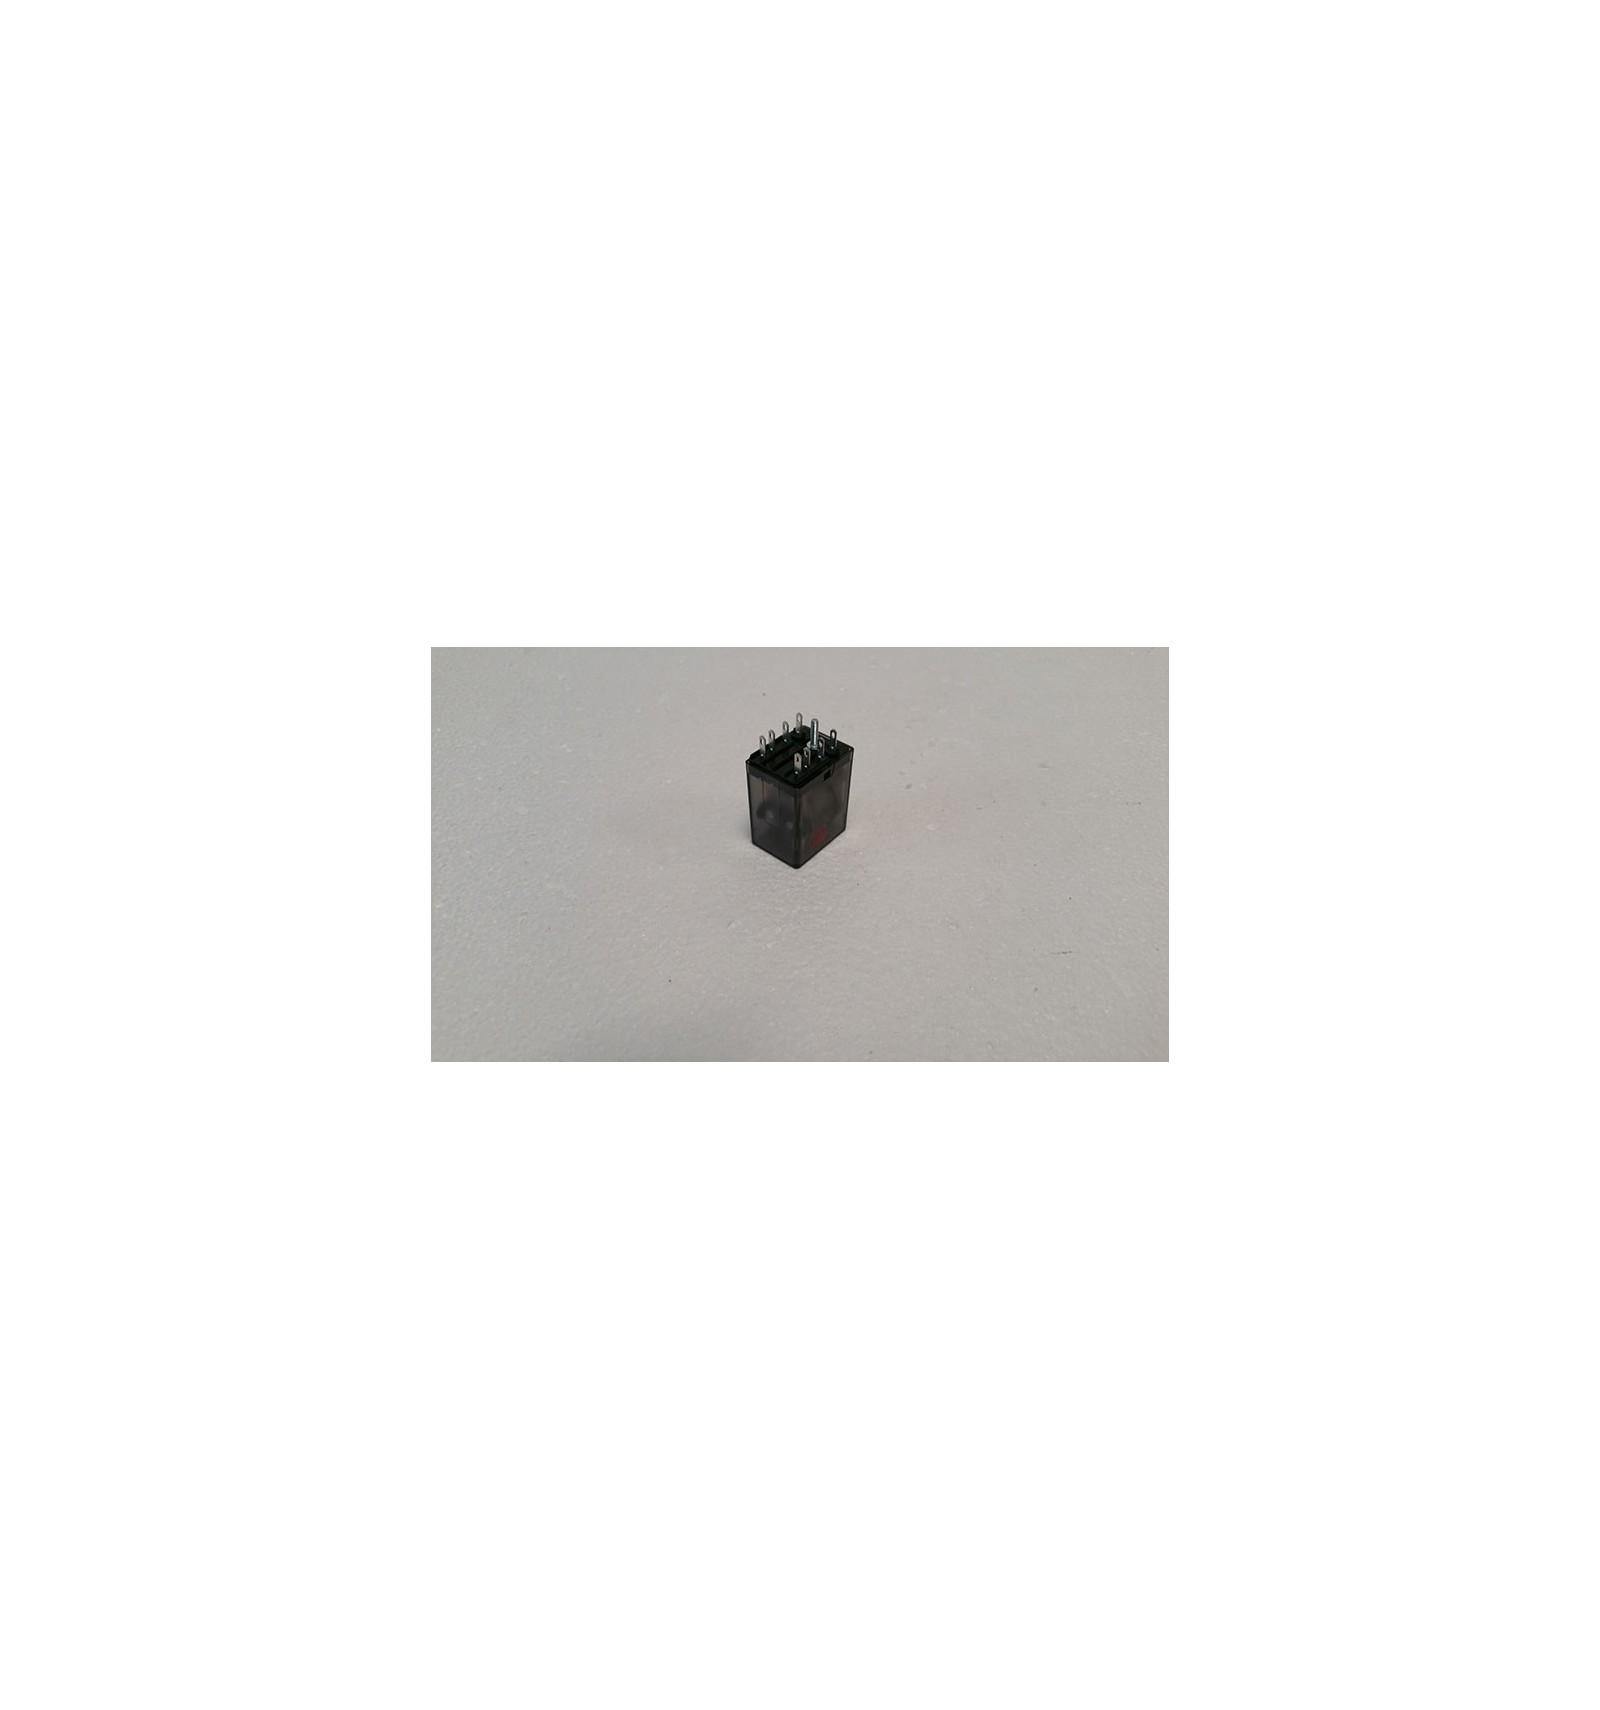 relais chauffe 12 volt nvelle ref 8076084 mjh55 enodis sav. Black Bedroom Furniture Sets. Home Design Ideas